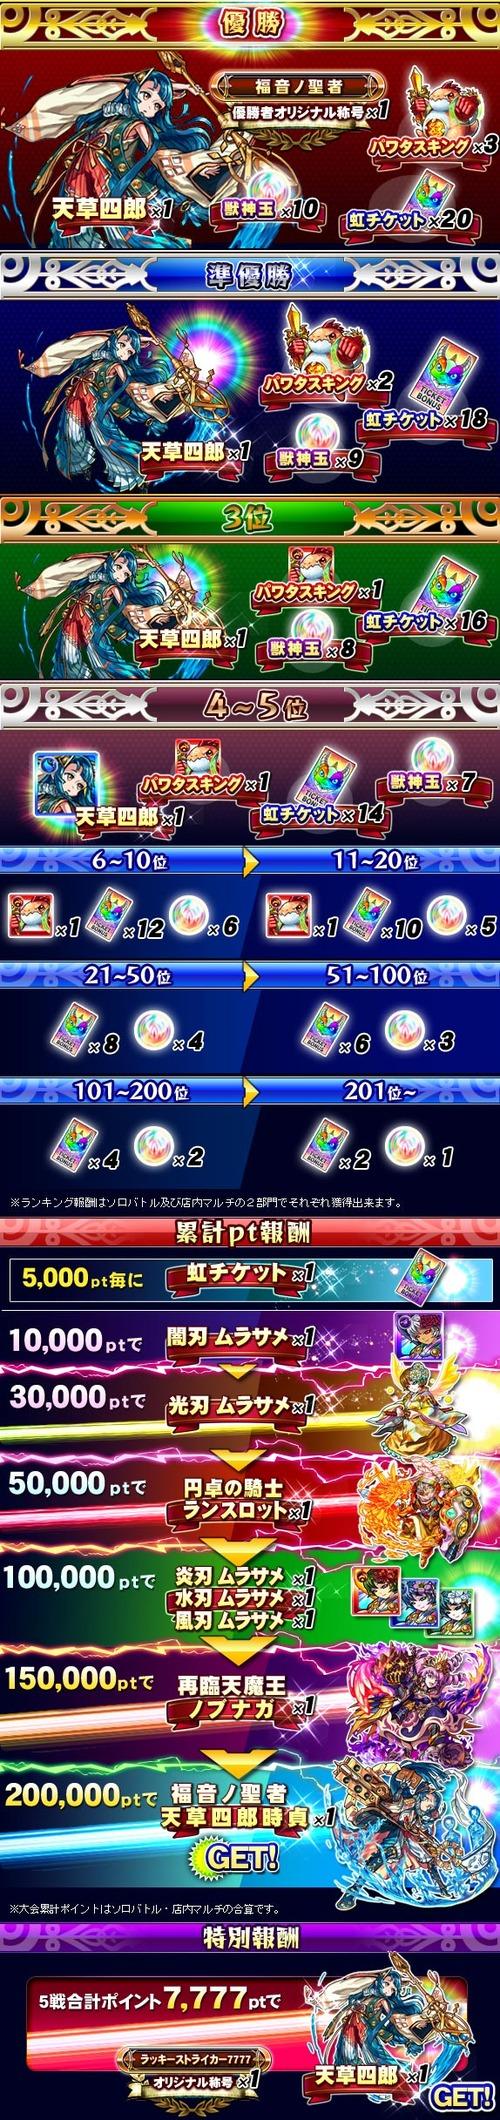 news_0421_1